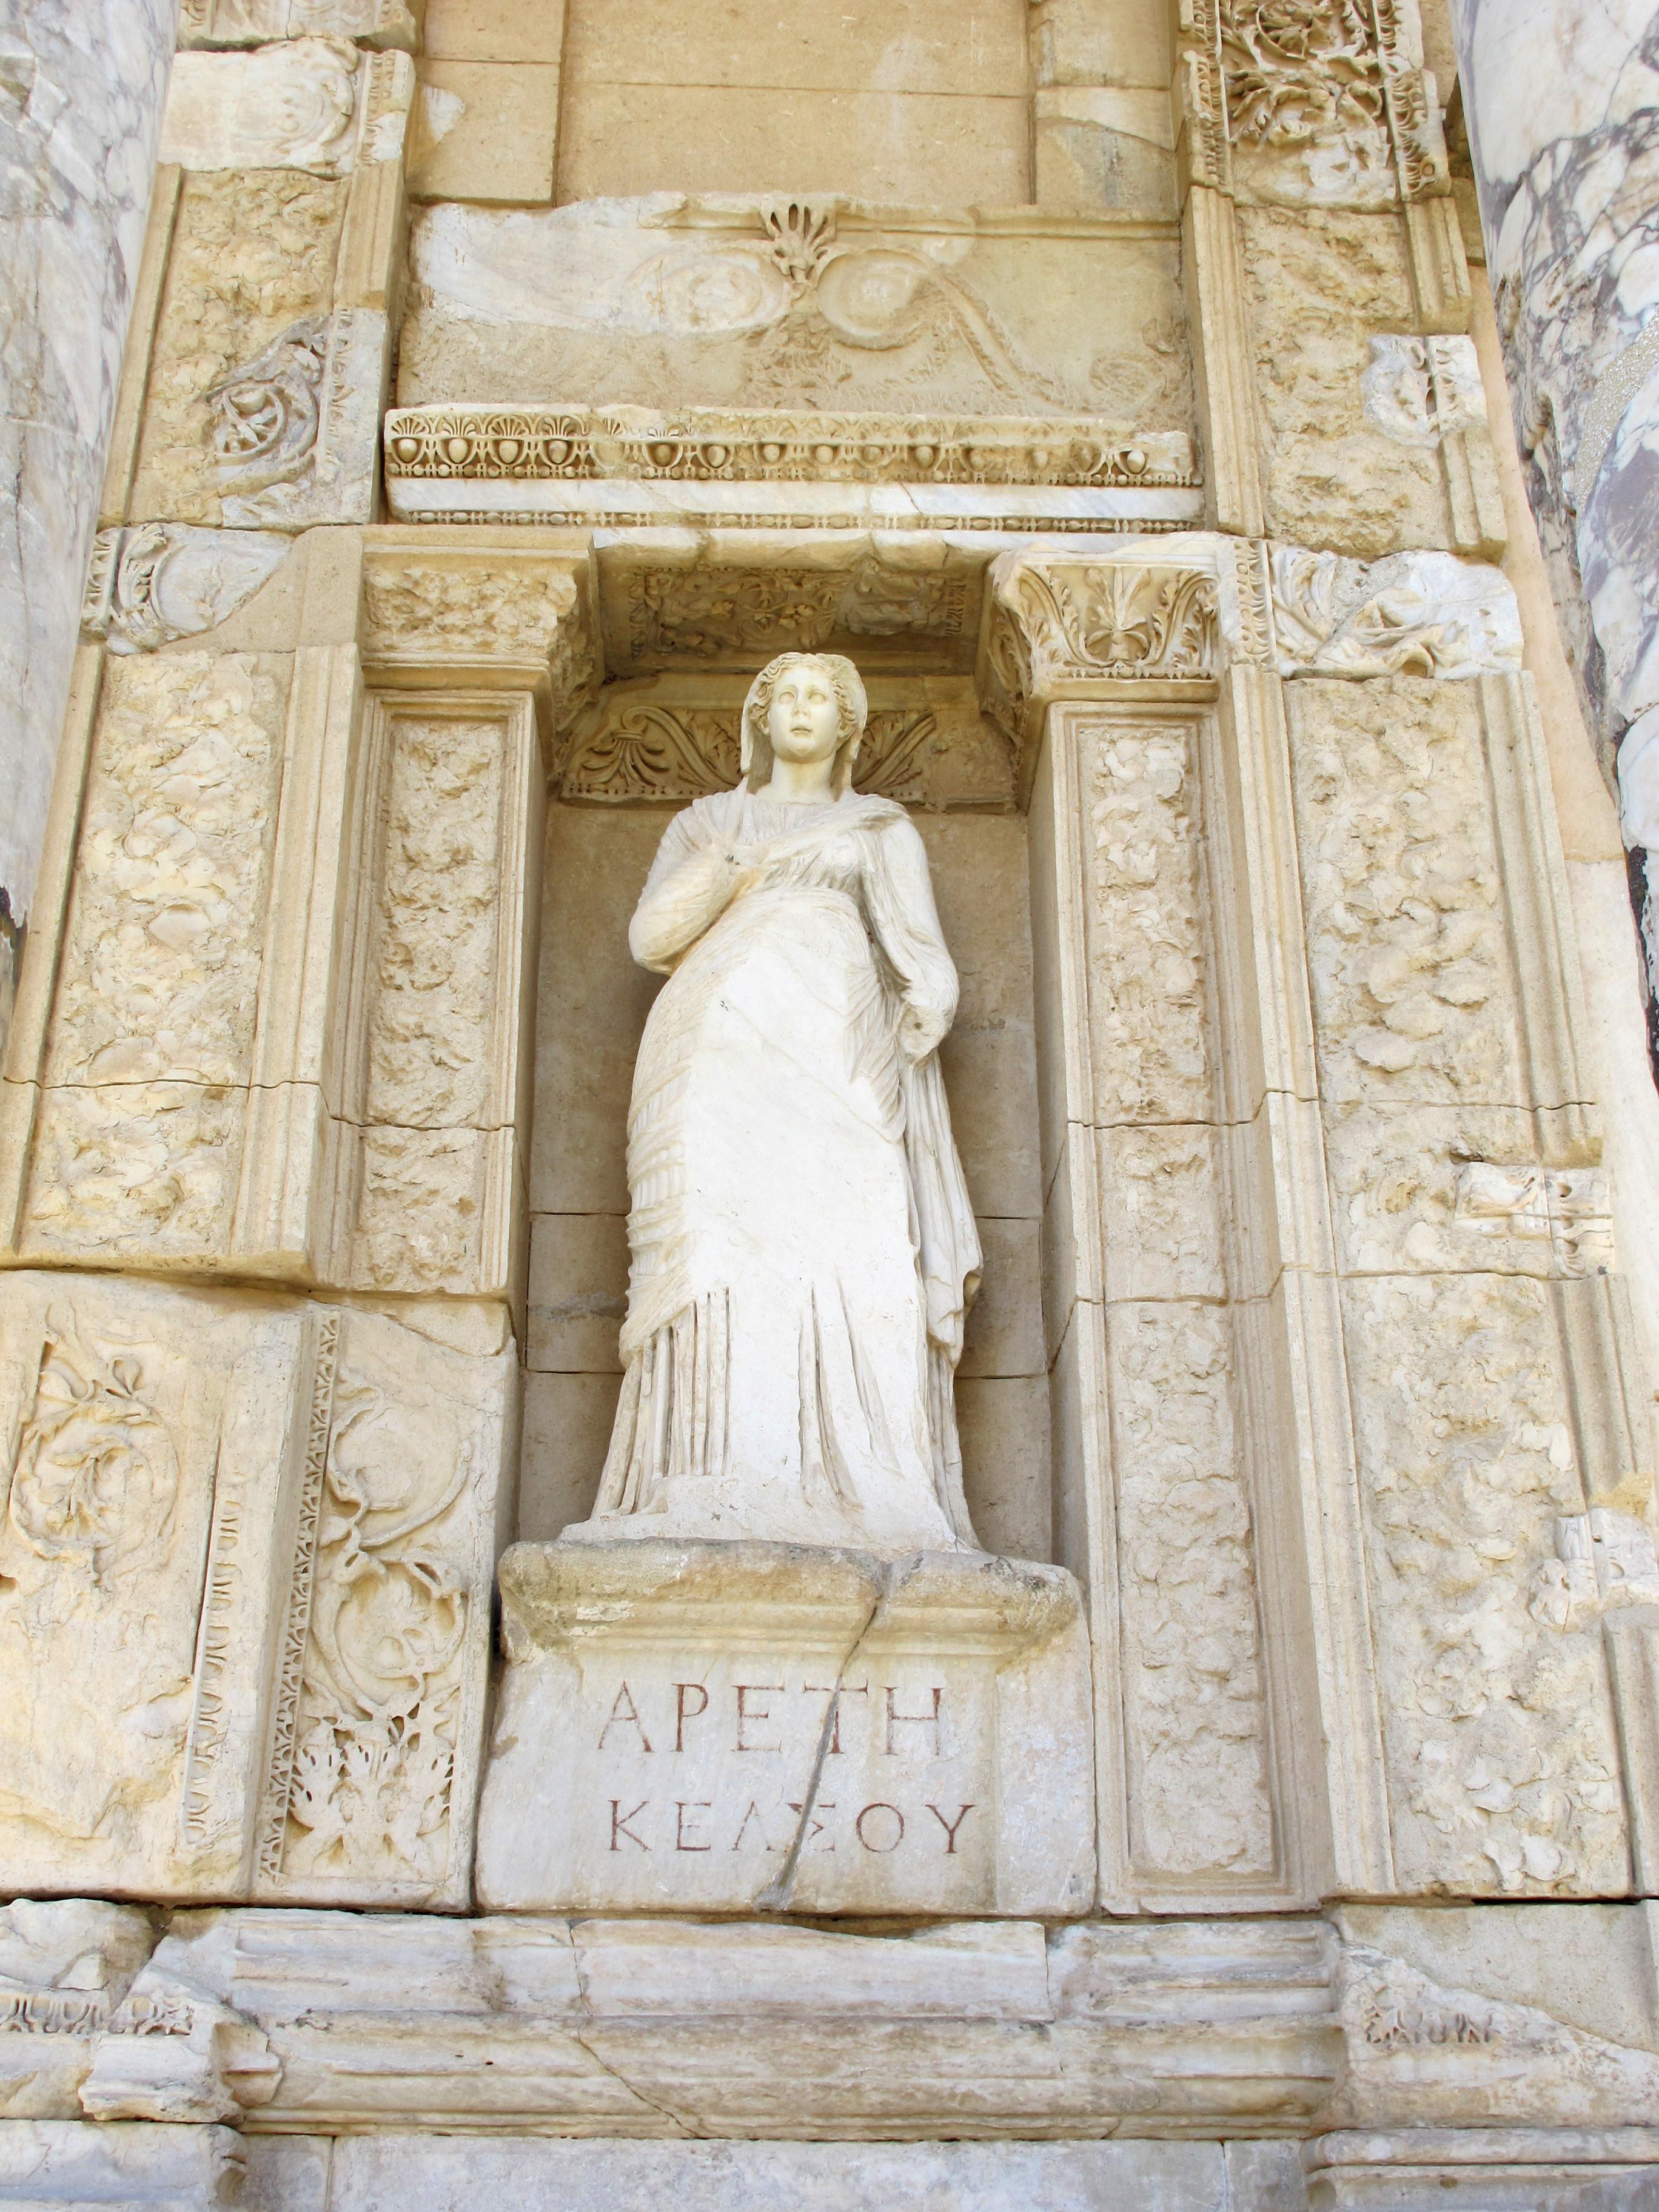 File:Efeso, biblioteca di celso 06 areti.JPG - Wikimedia Commons